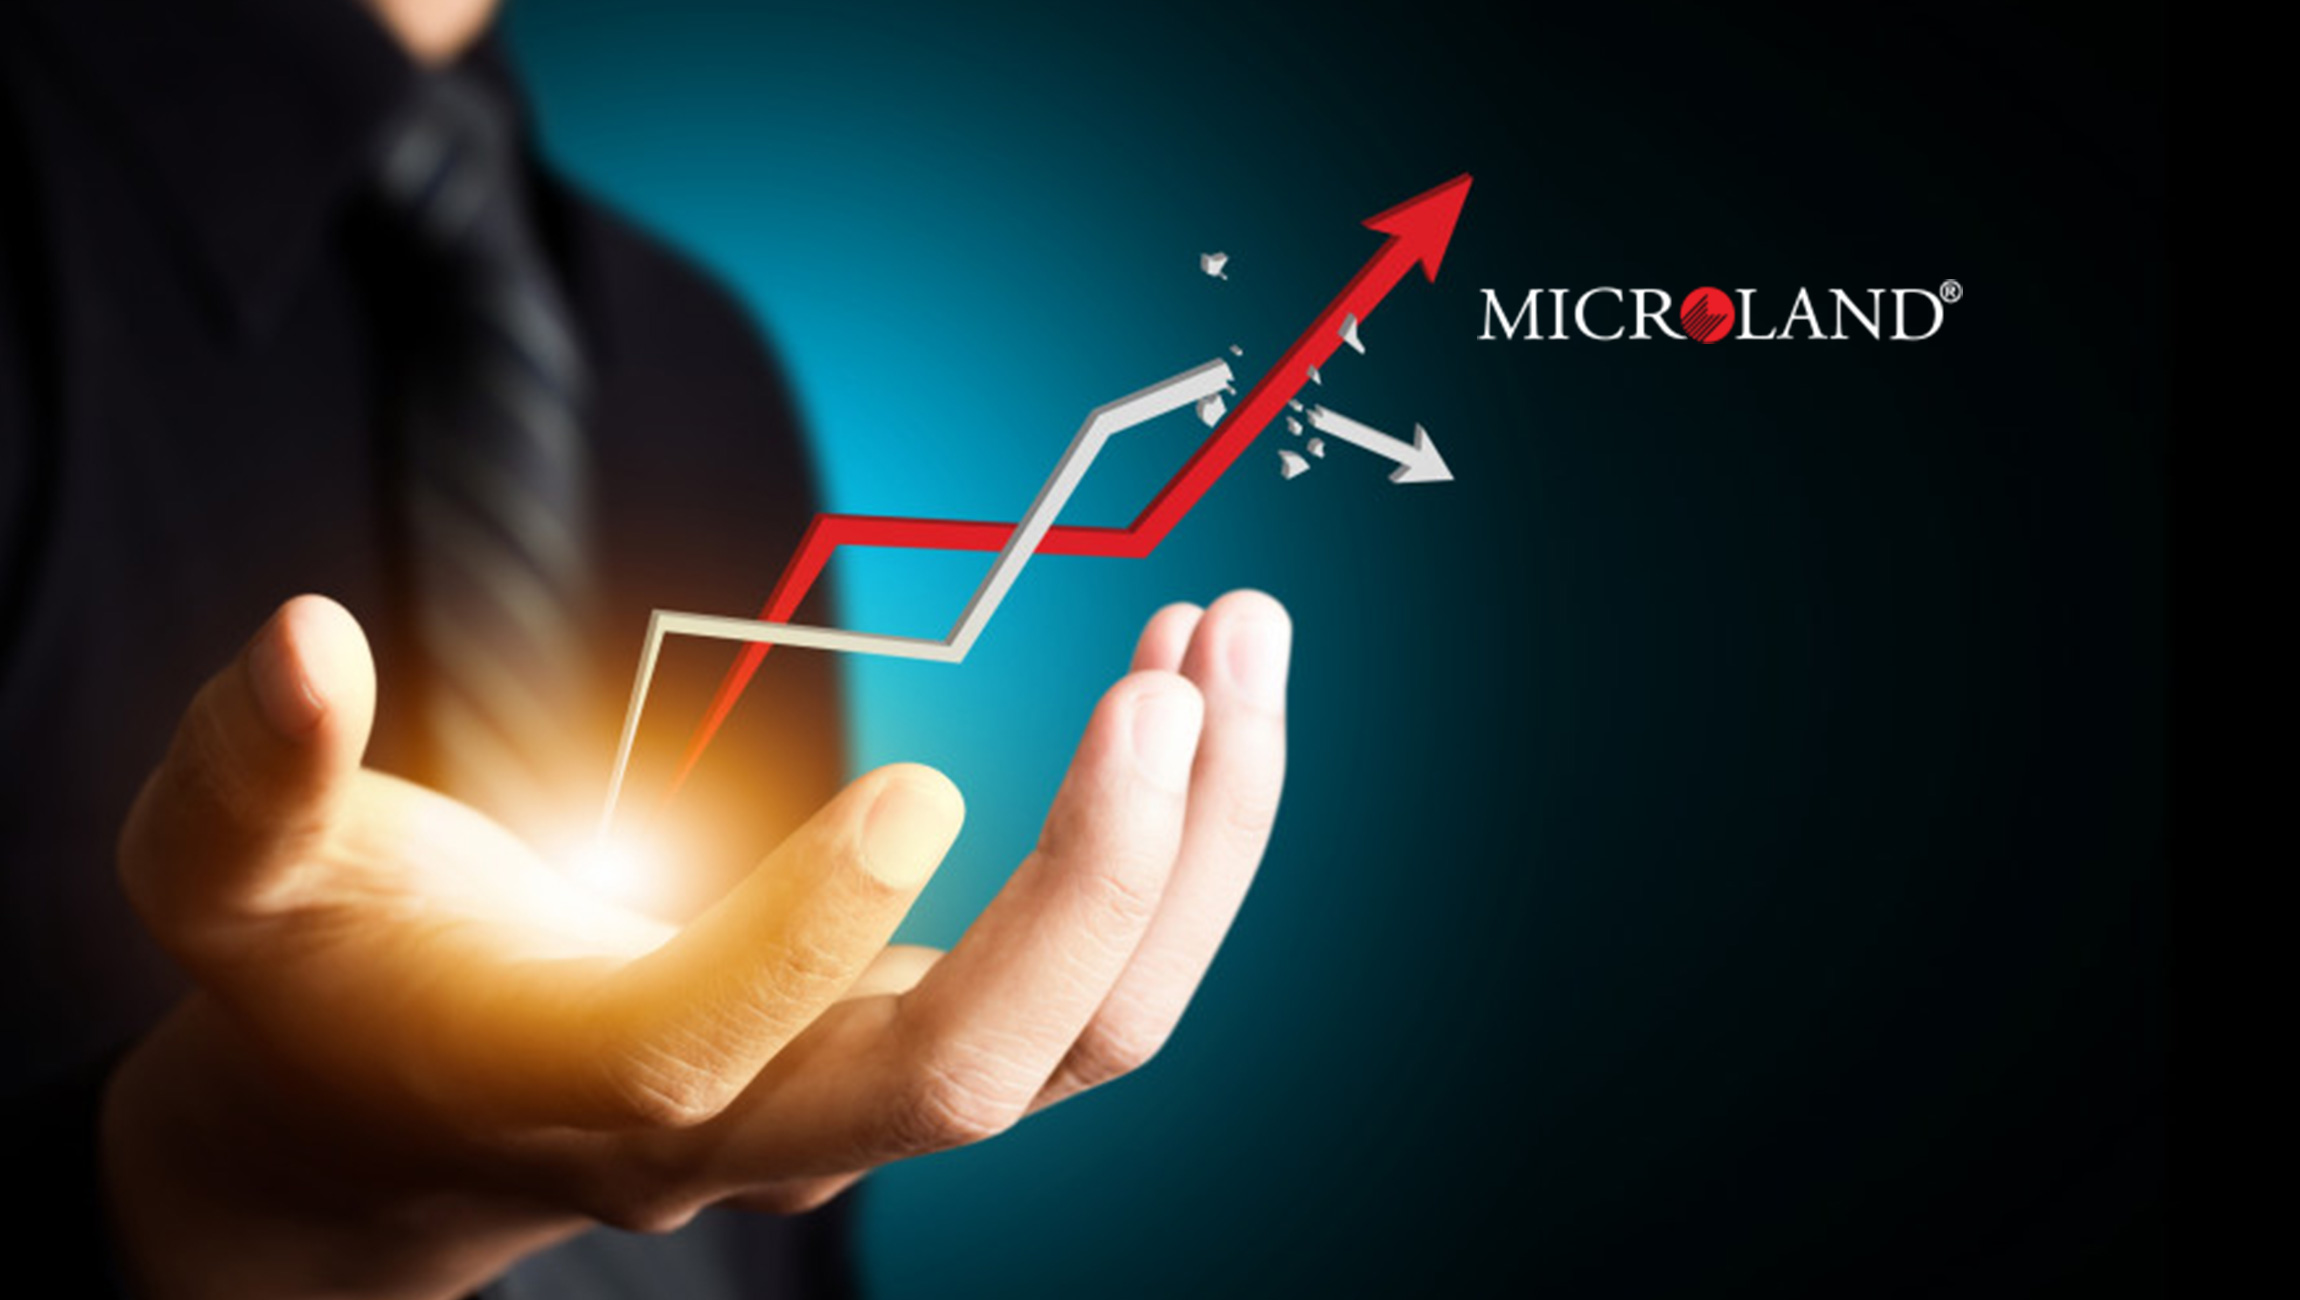 Microland Names Ashish Mahadwar as President for Global Sales & Marketing